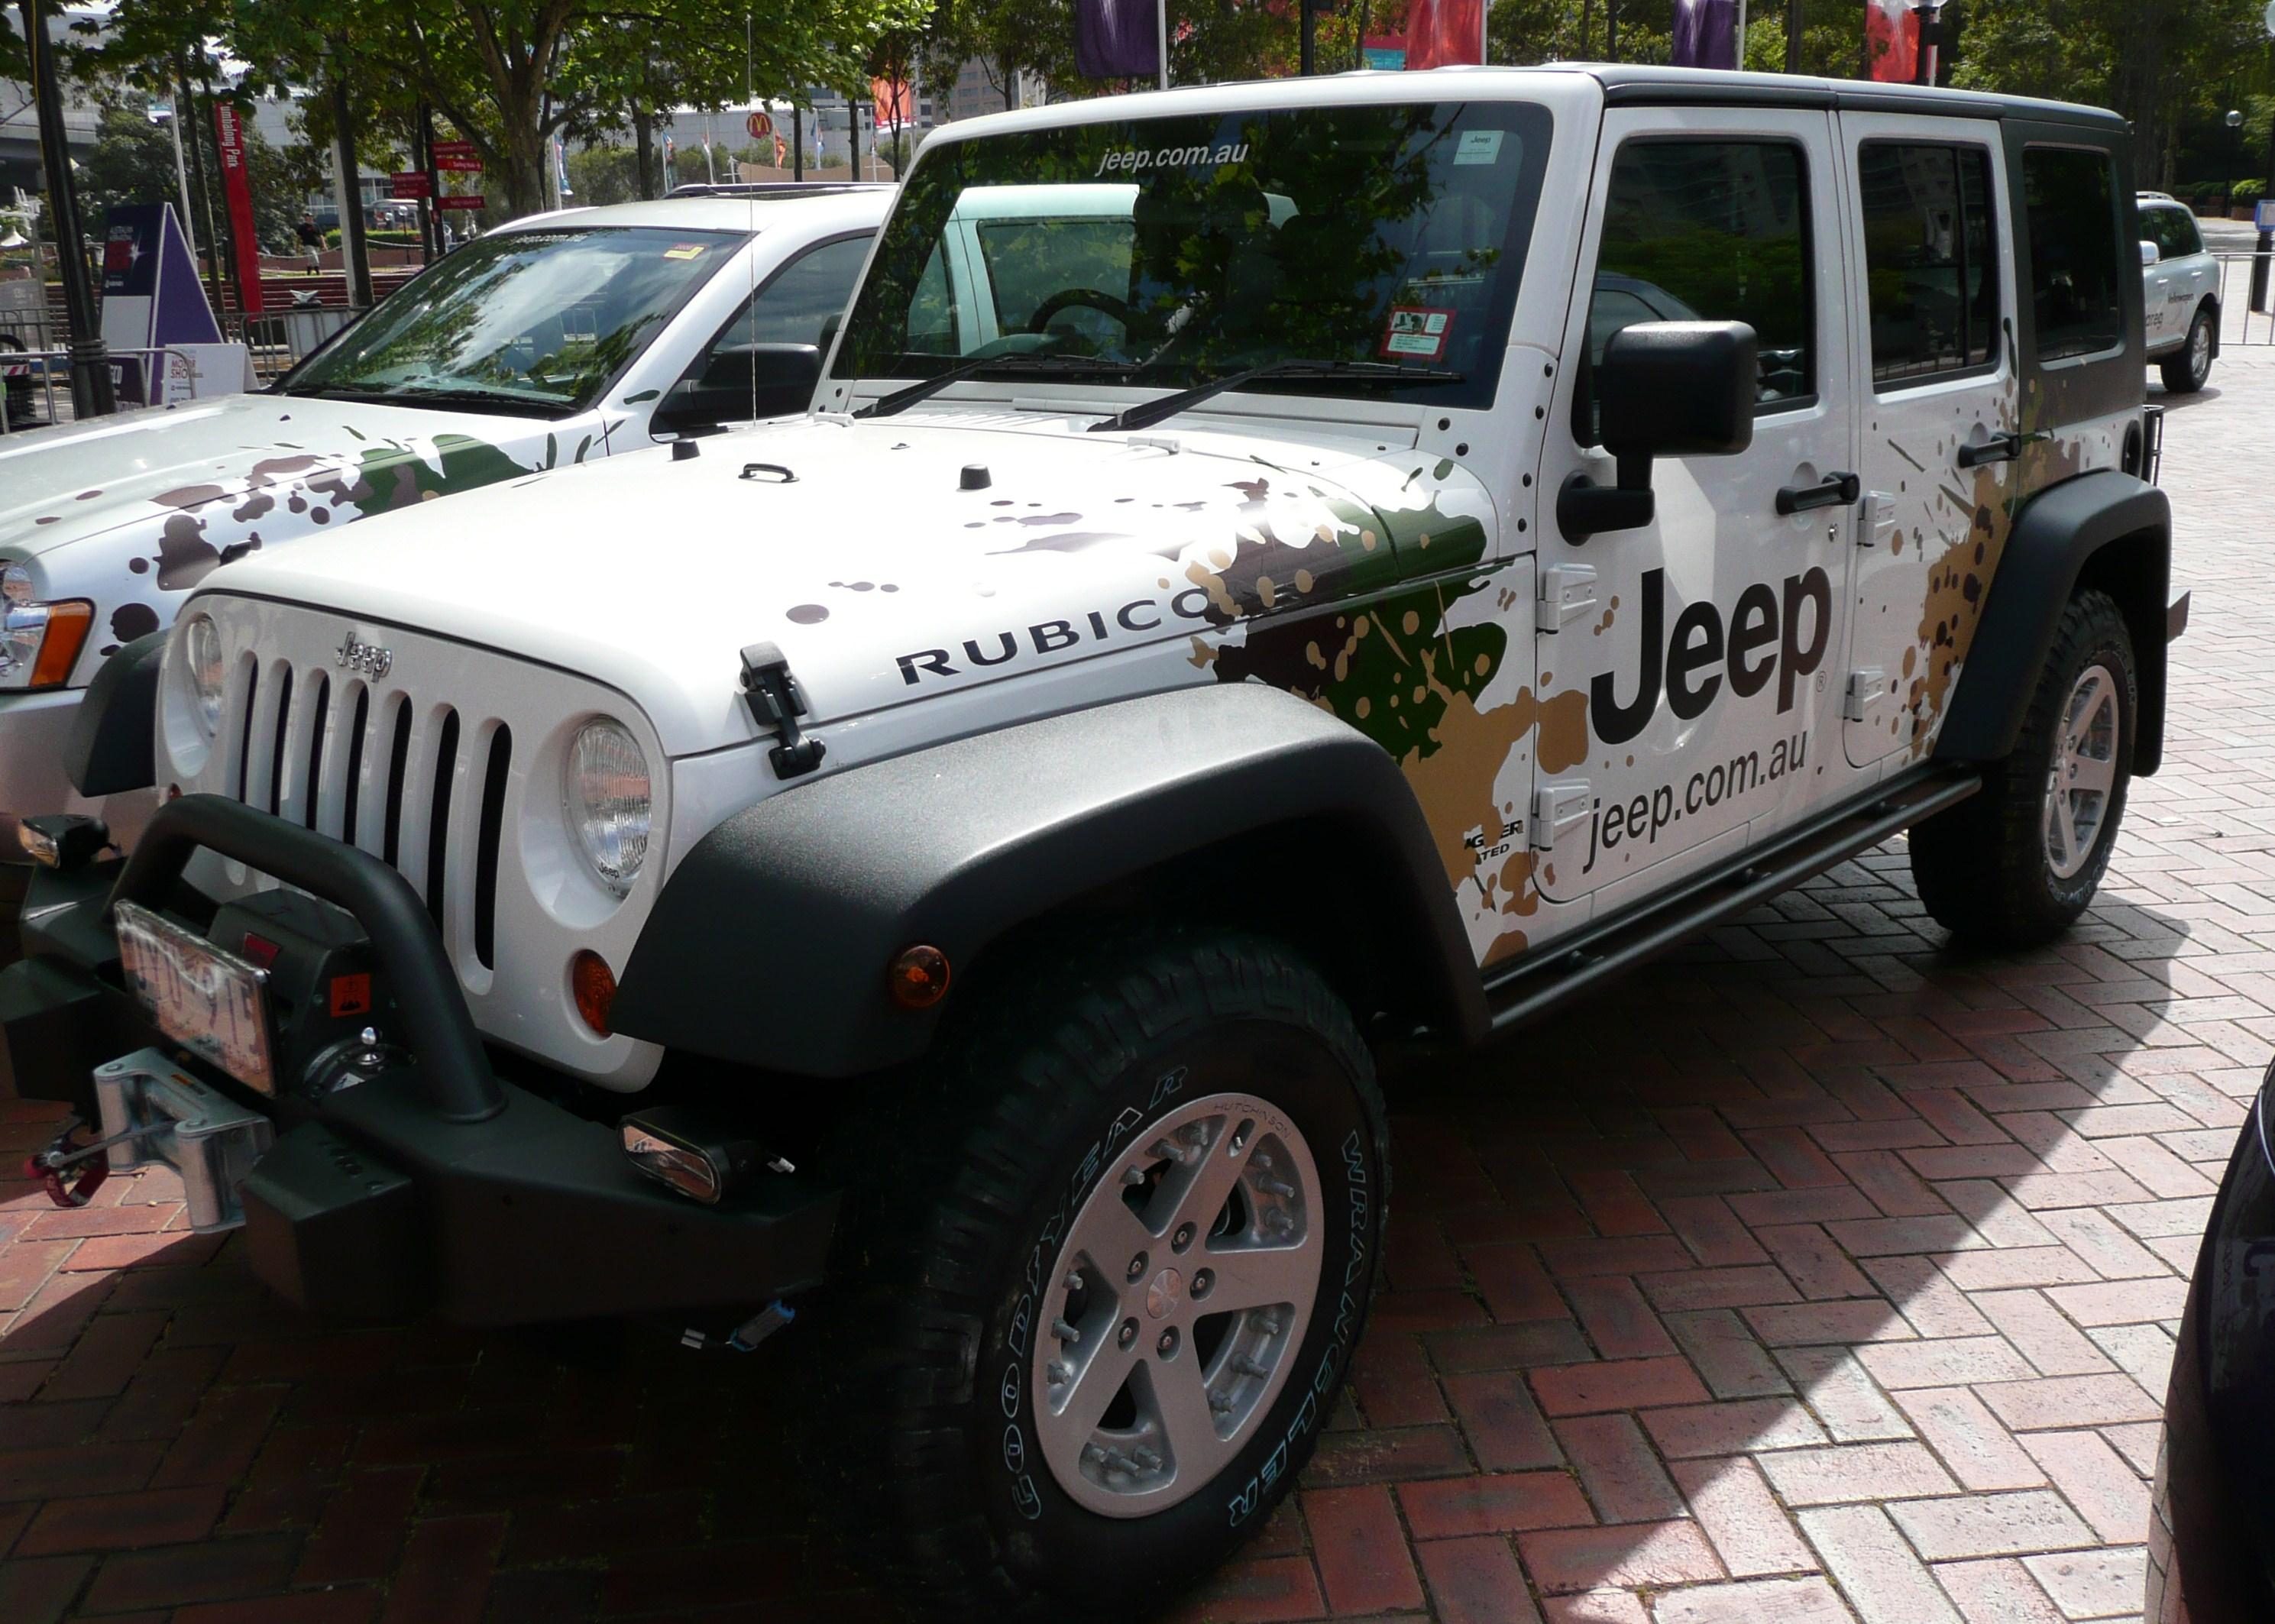 File:2007 Jeep Wrangler JK Unlimited Rubicon Softtop